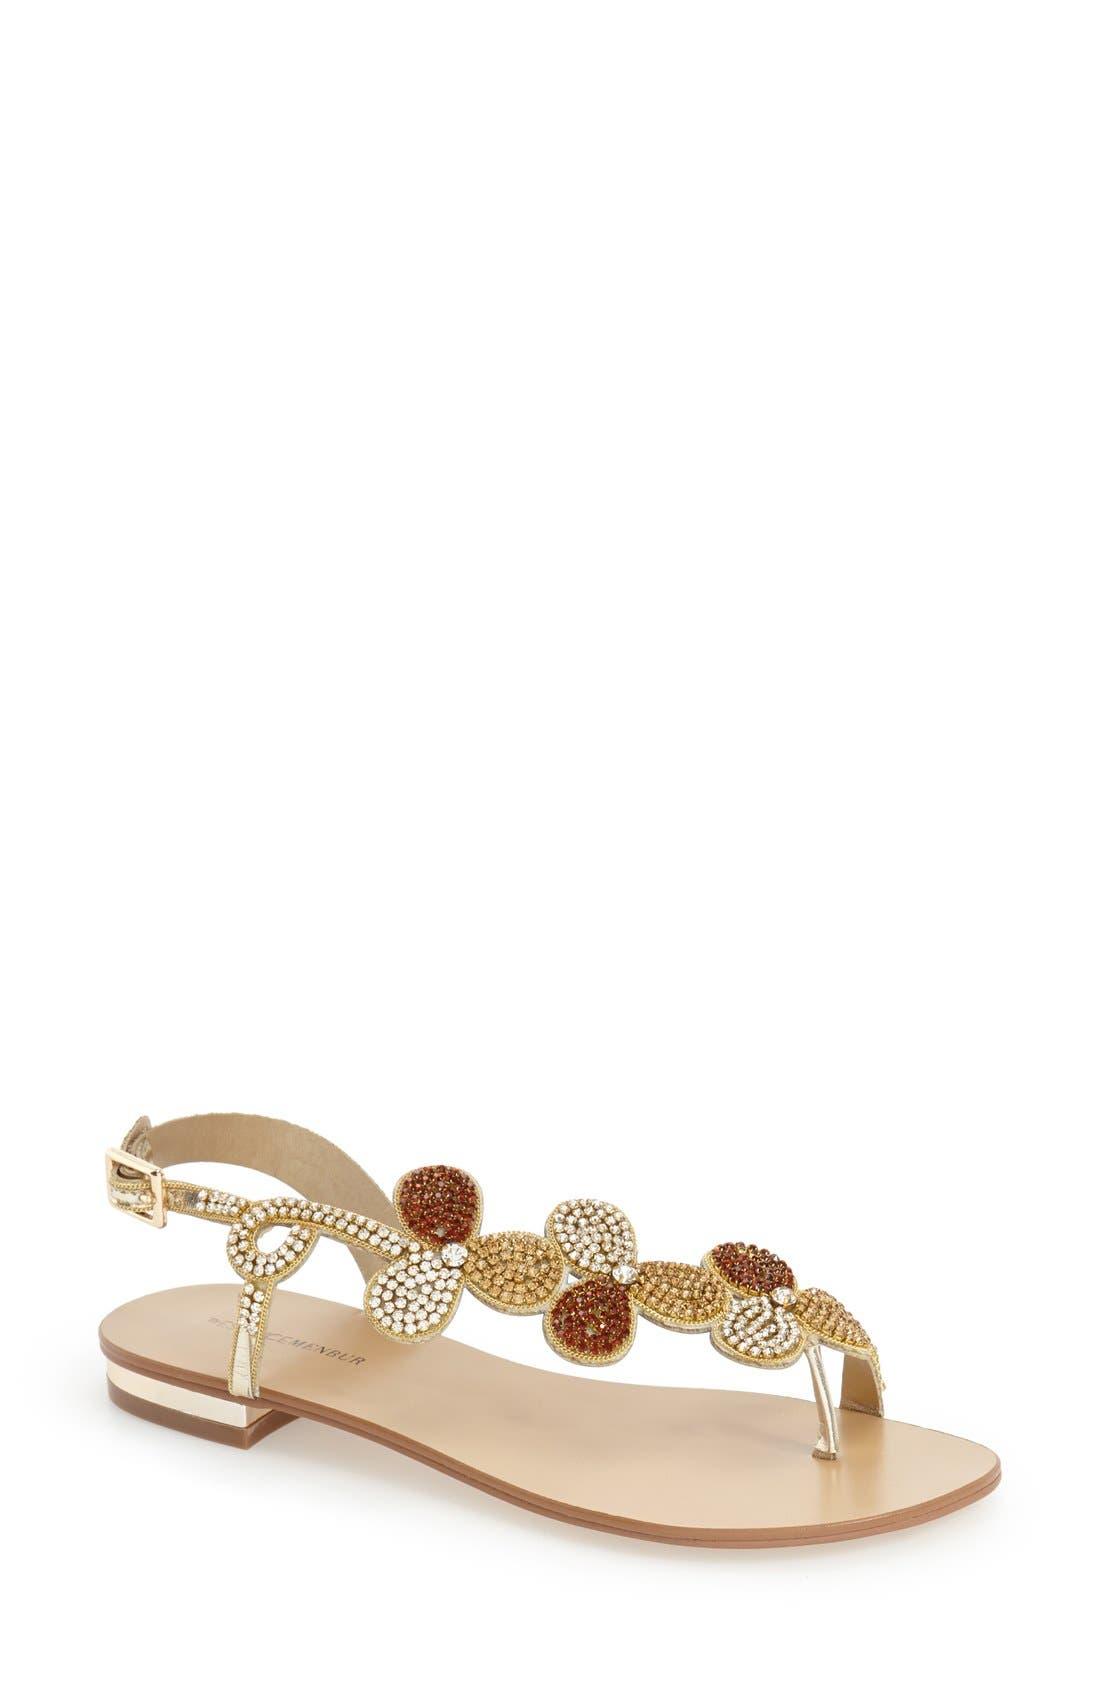 MENBUR 'Gunmiel' Crystal Embellished Flat Sandal